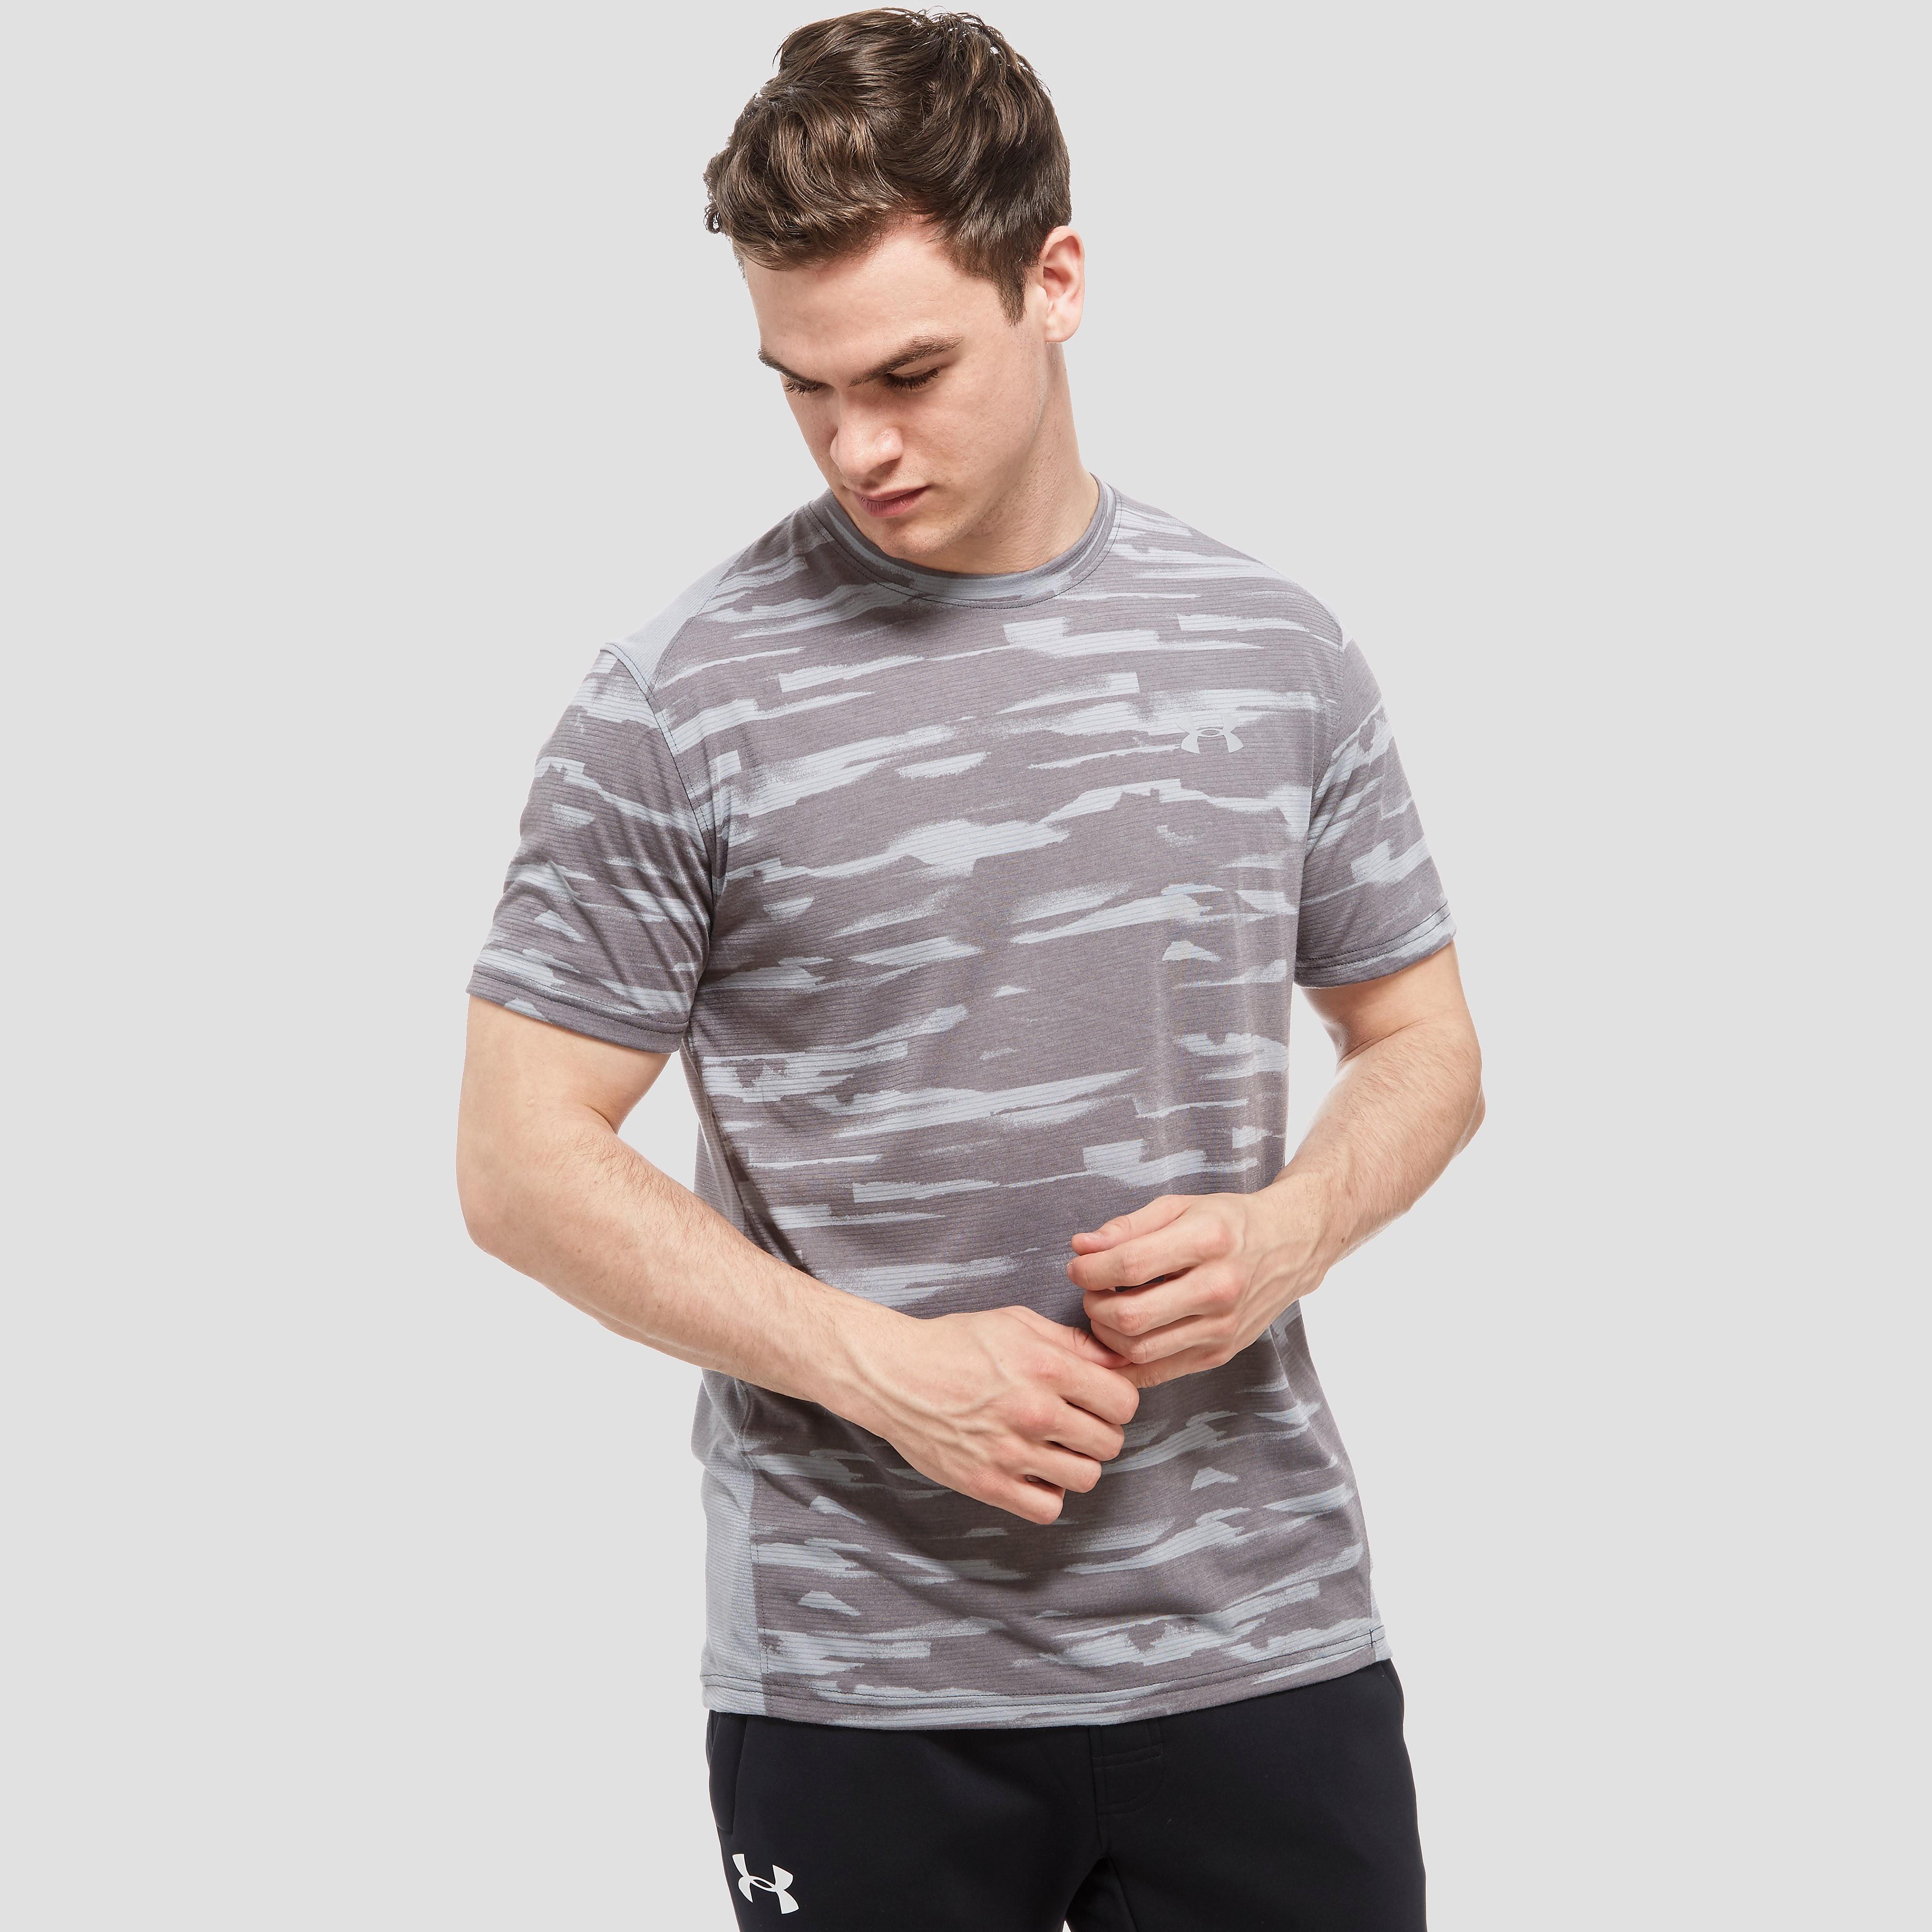 Under Armour TB Run Mesh Men's T-Shirt